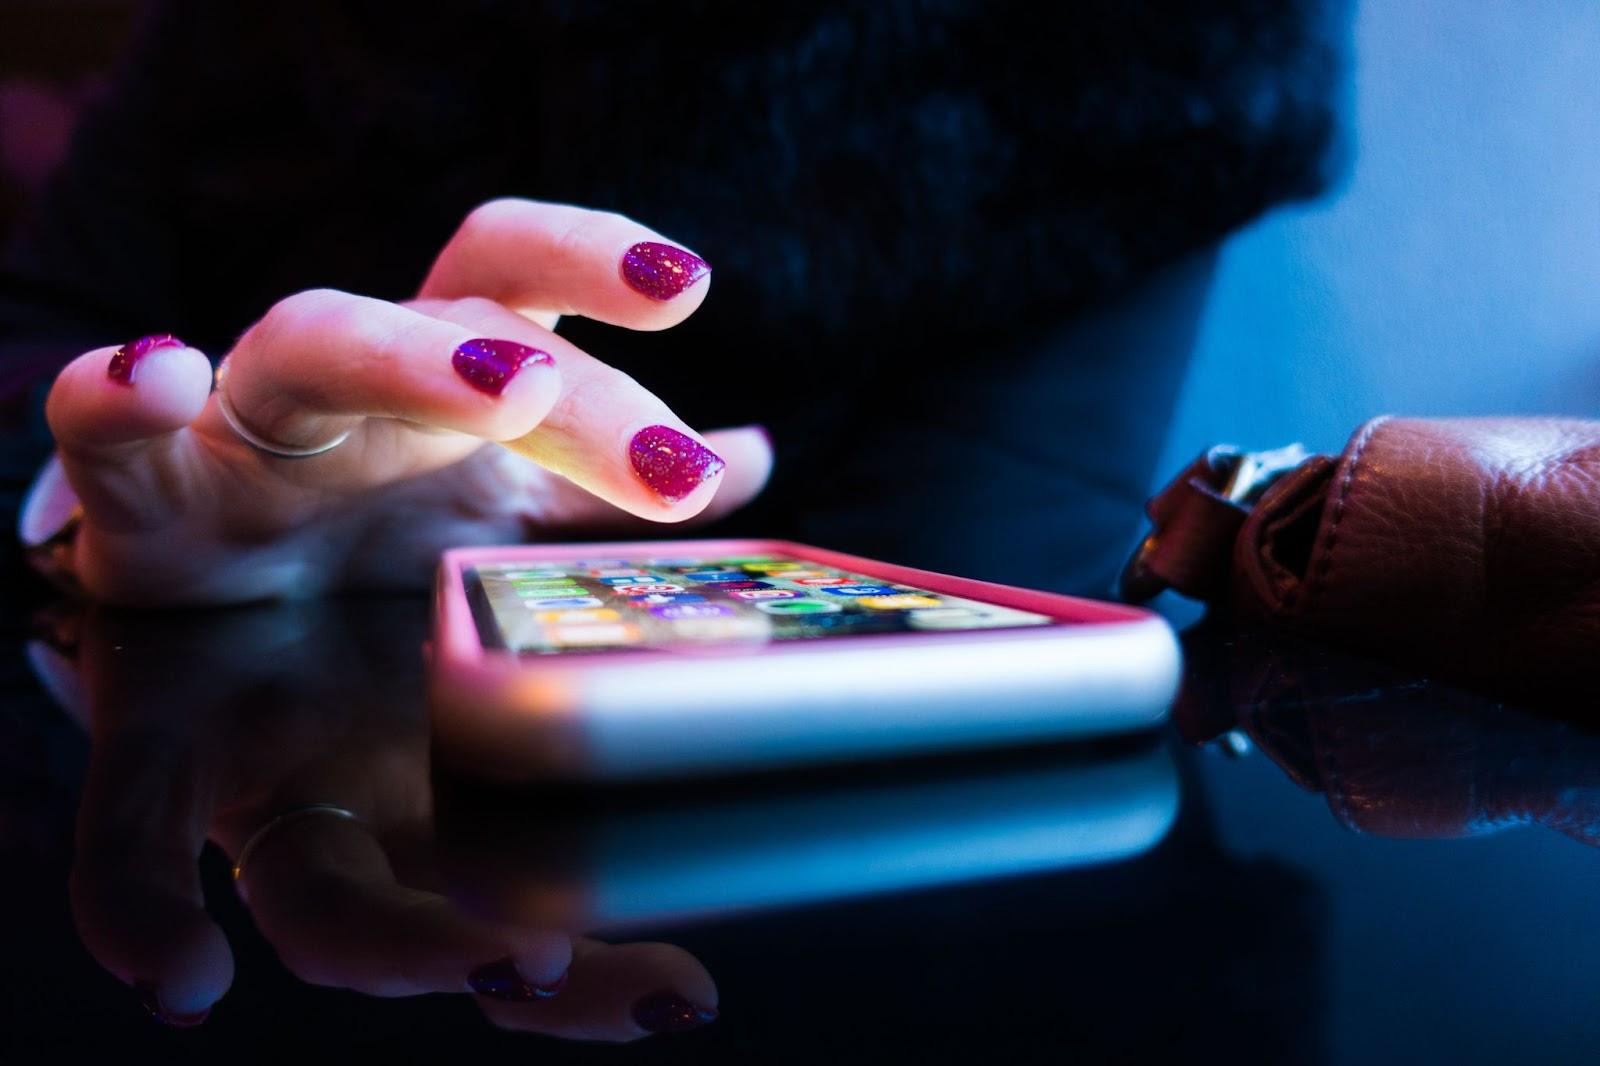 touching the phone screen